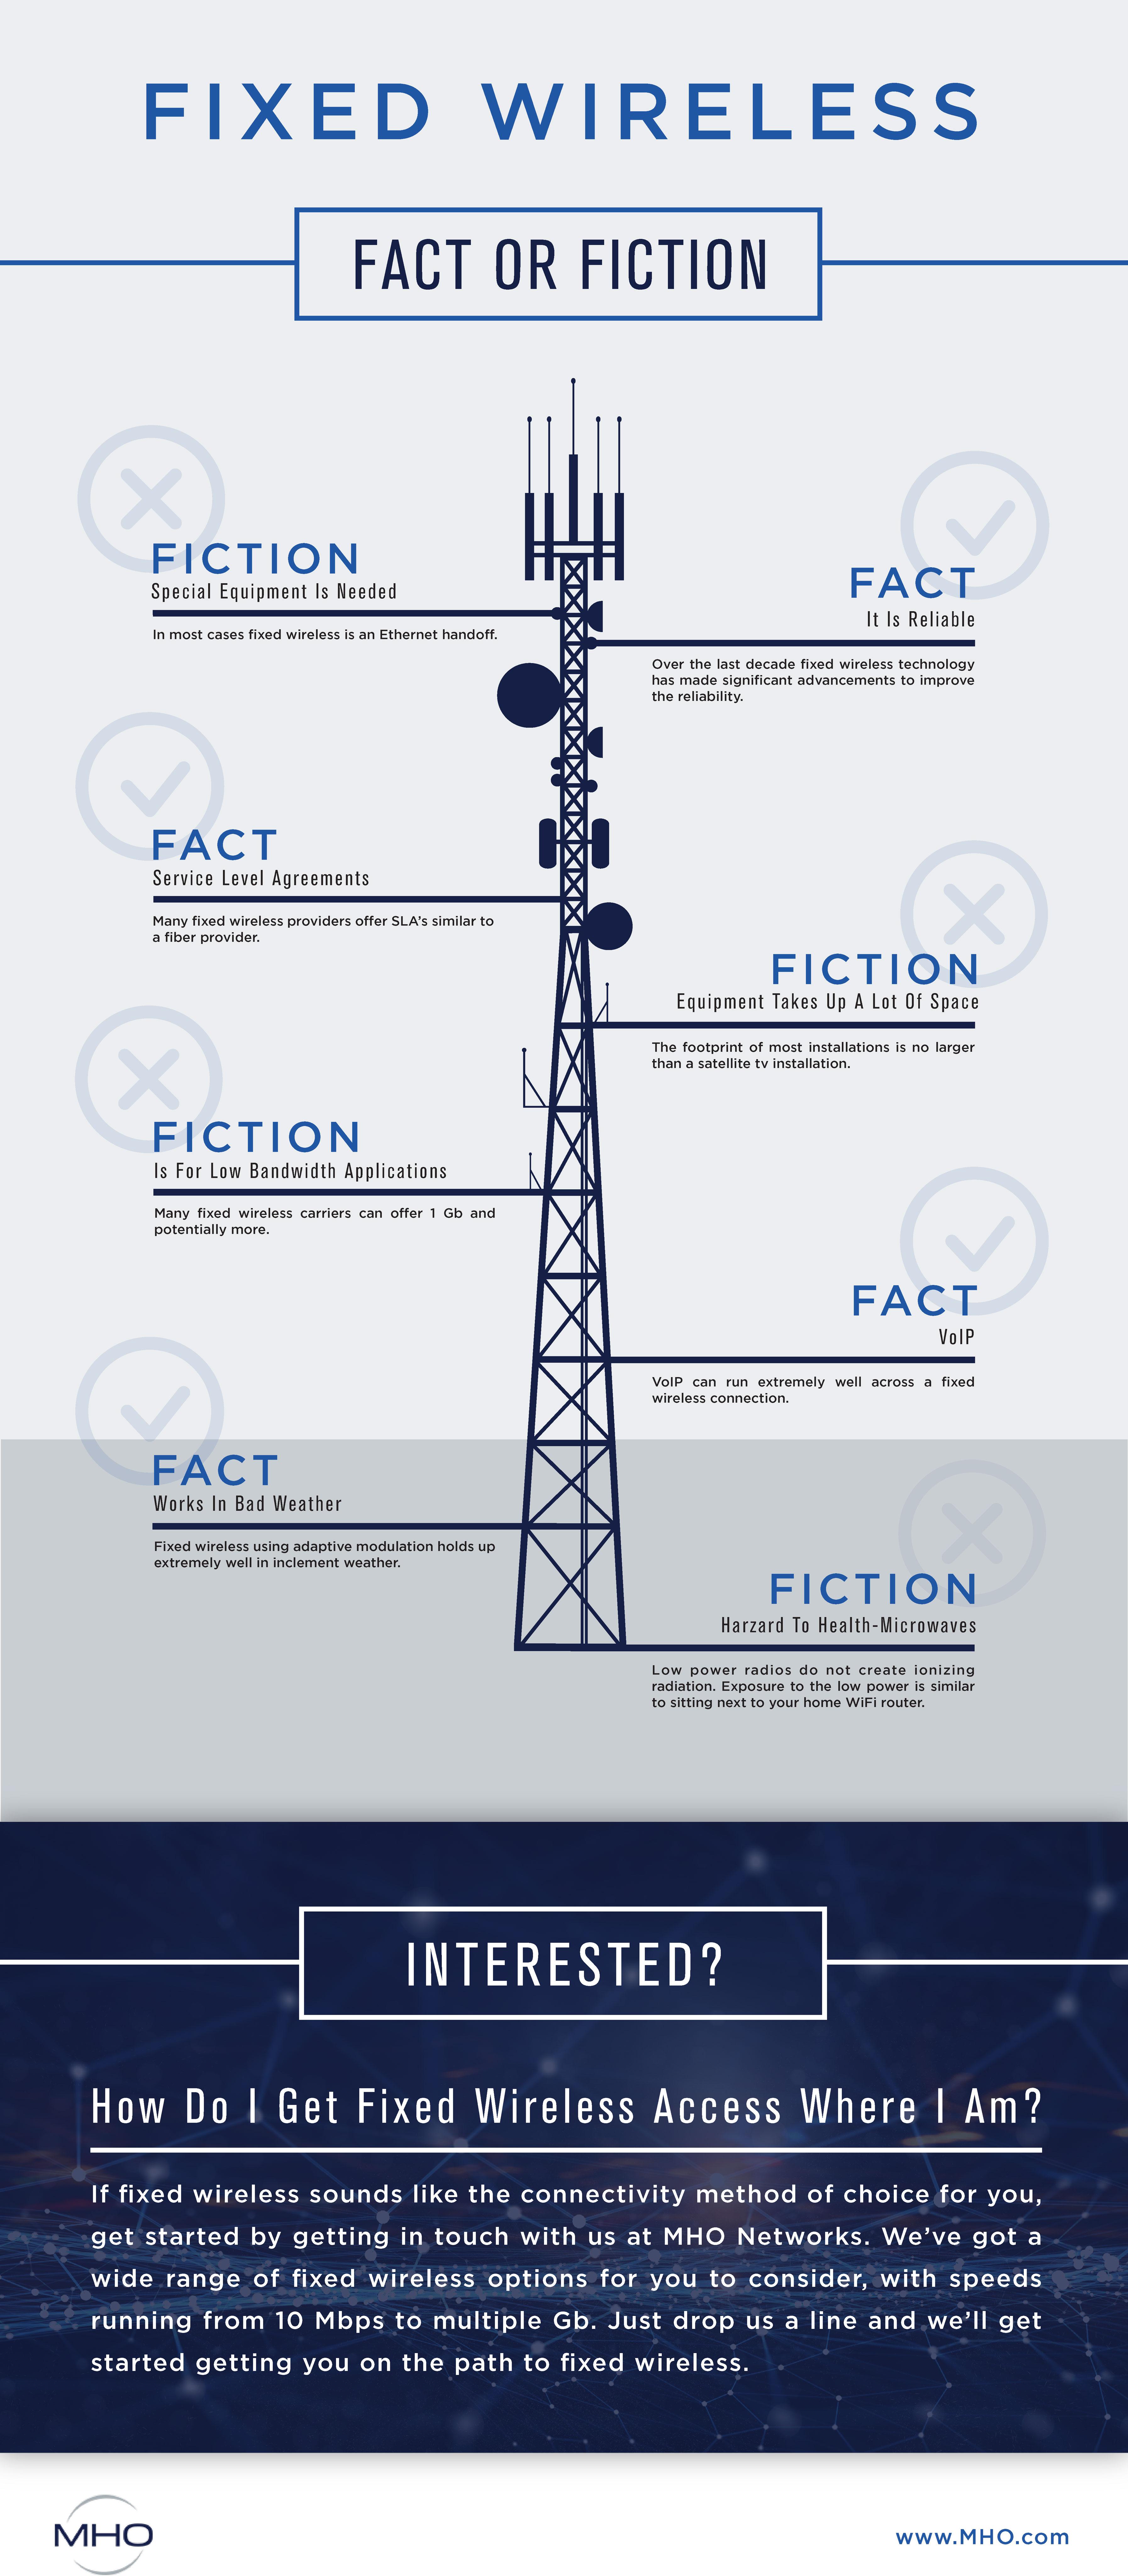 MHO-Fact-vs-Fiction-Infographic